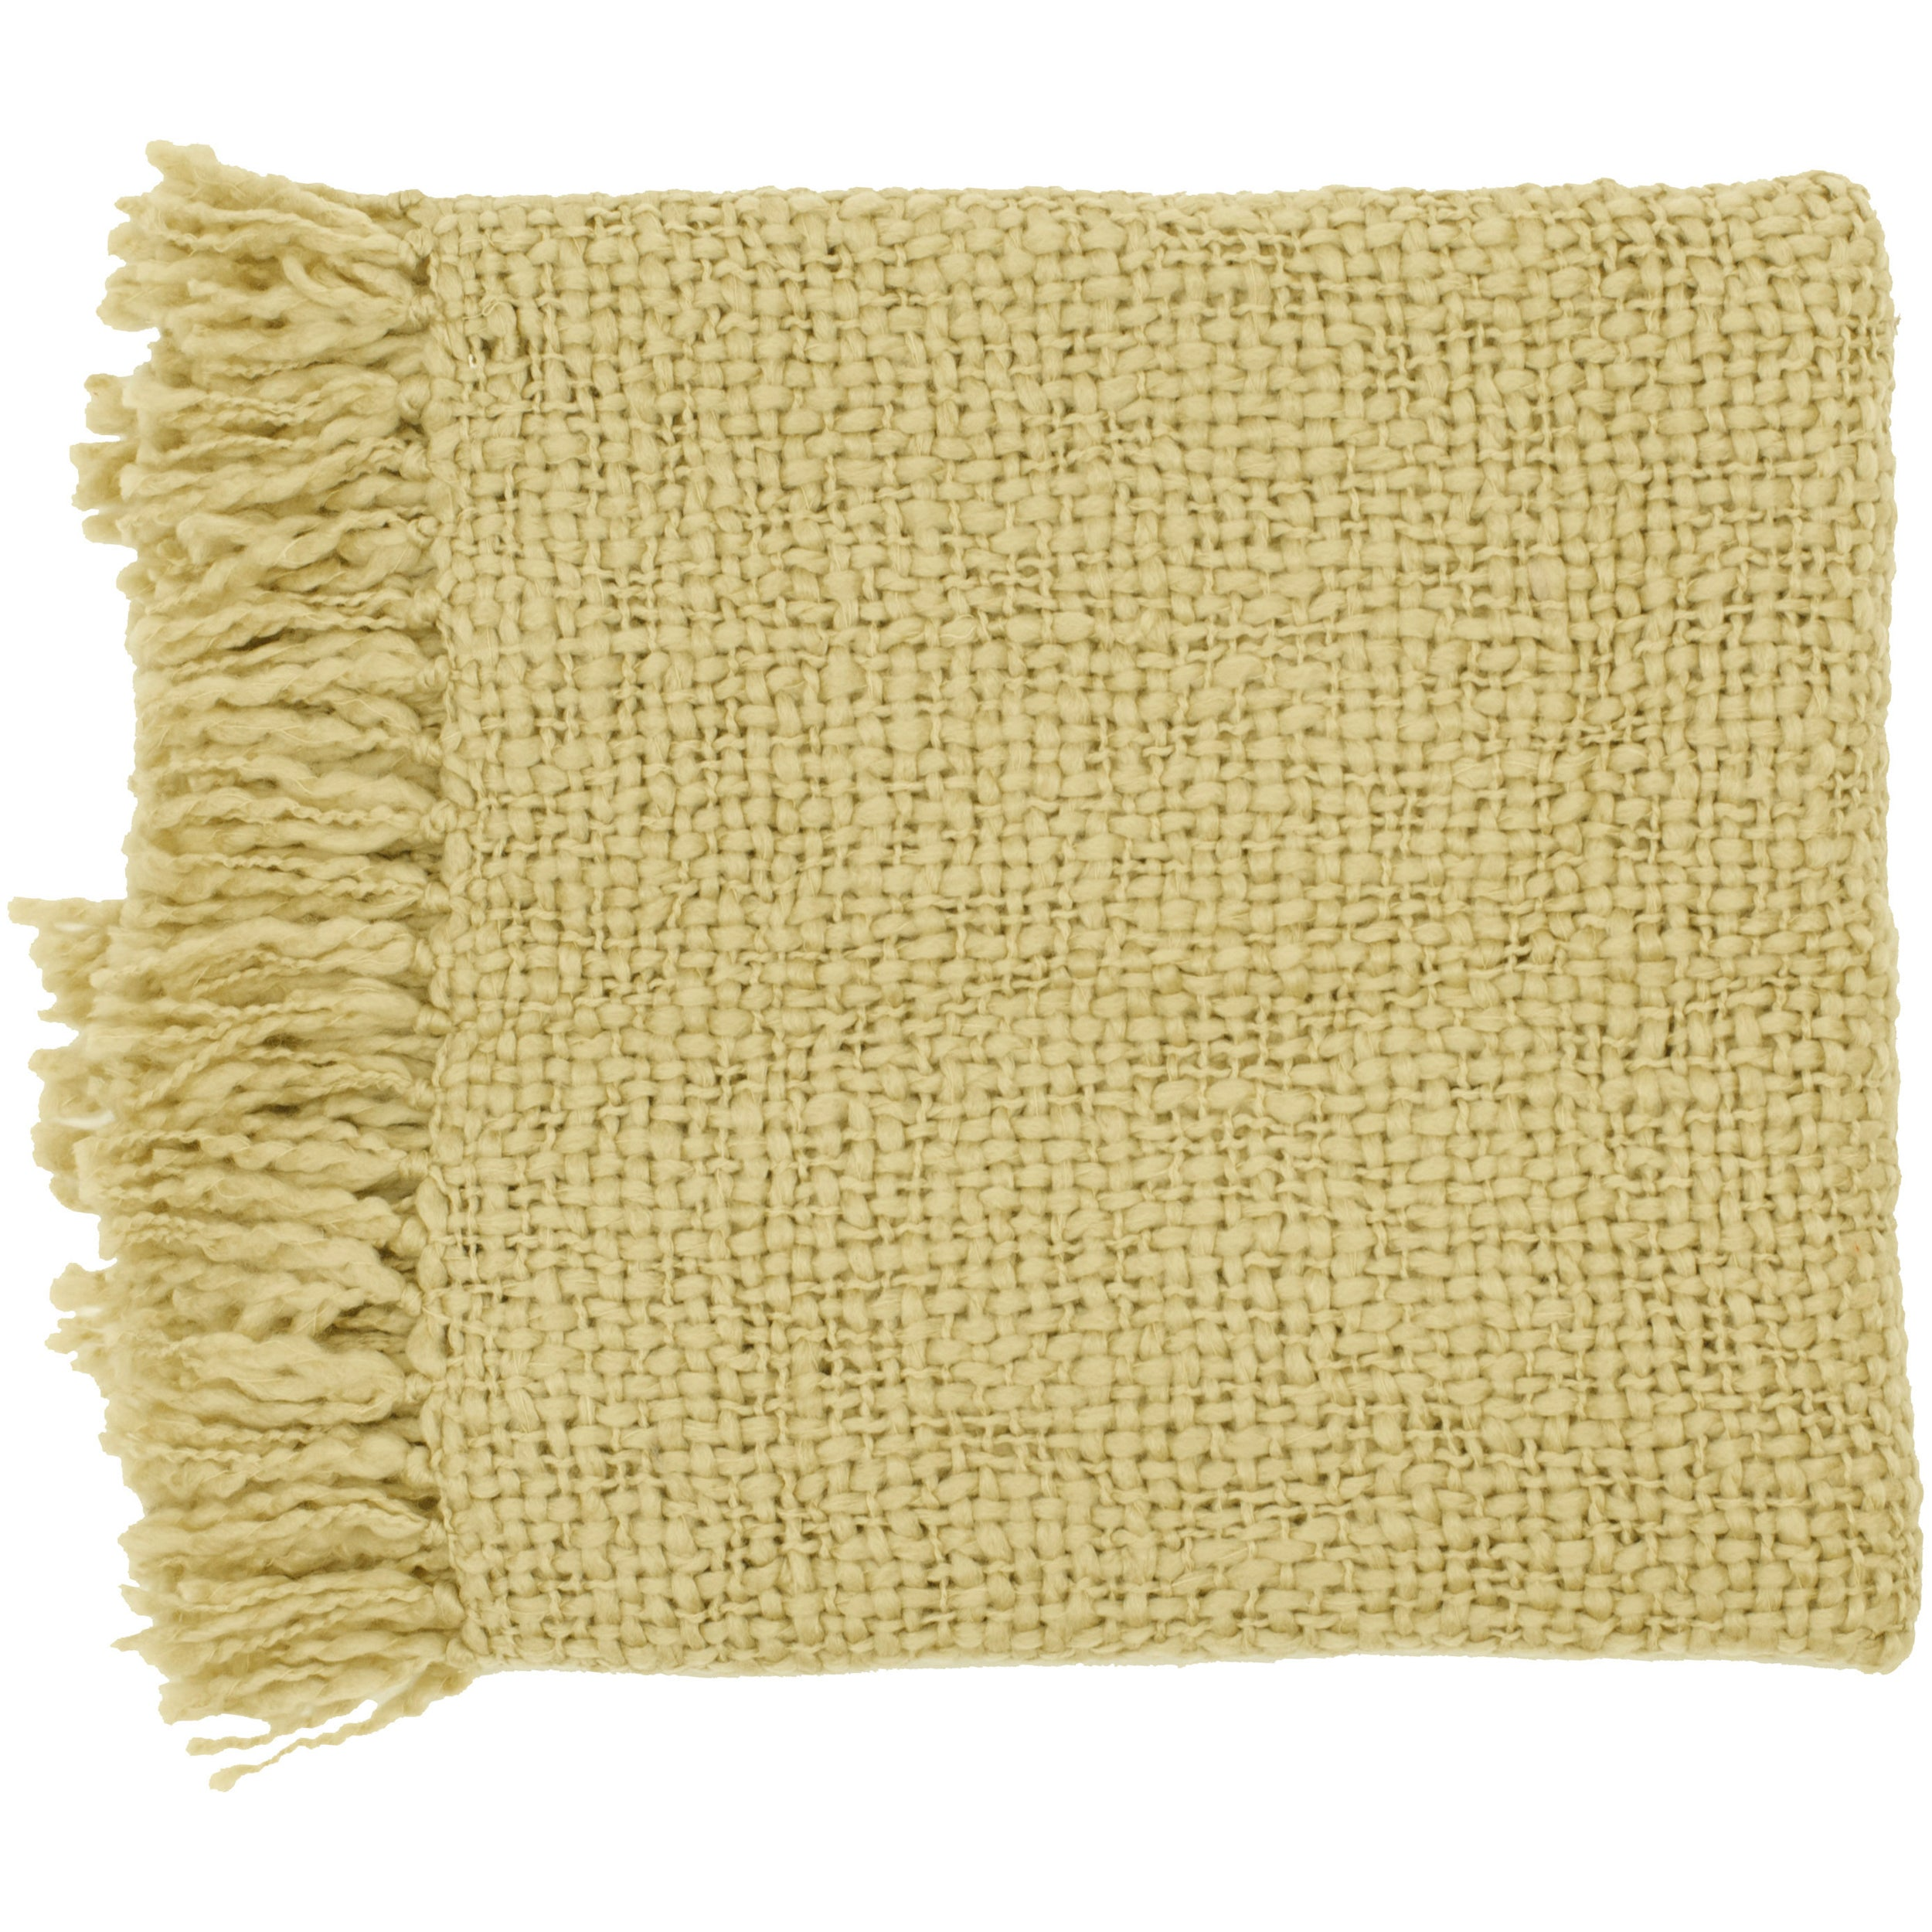 Woven Arbor Acrylic and Wool Throw Blanket